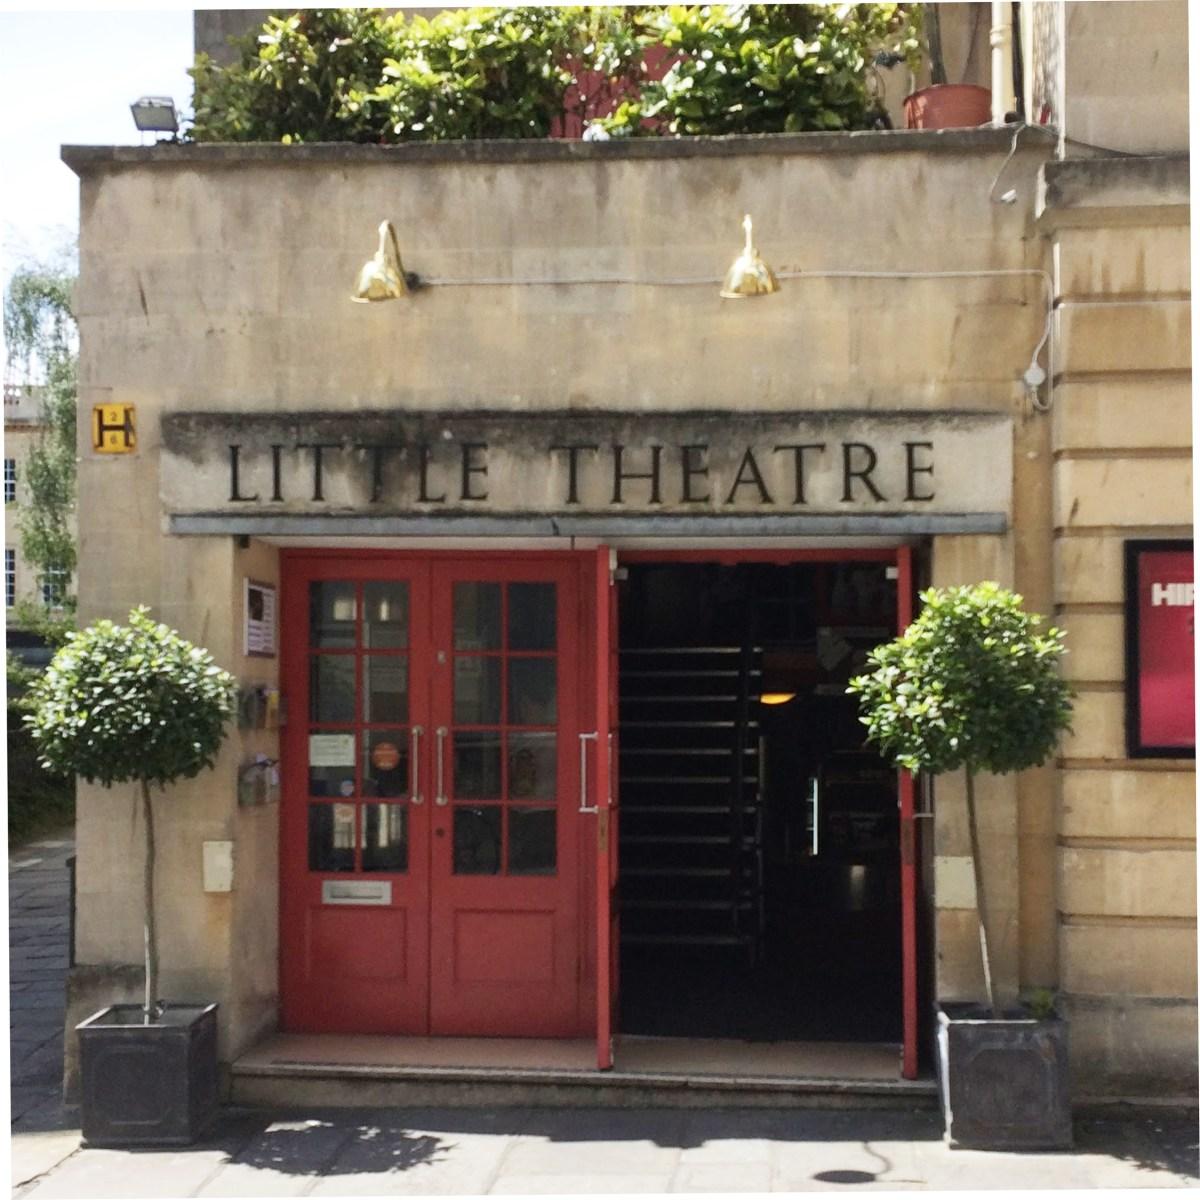 Little Theatre (Credit: Sian Francis-Cox)